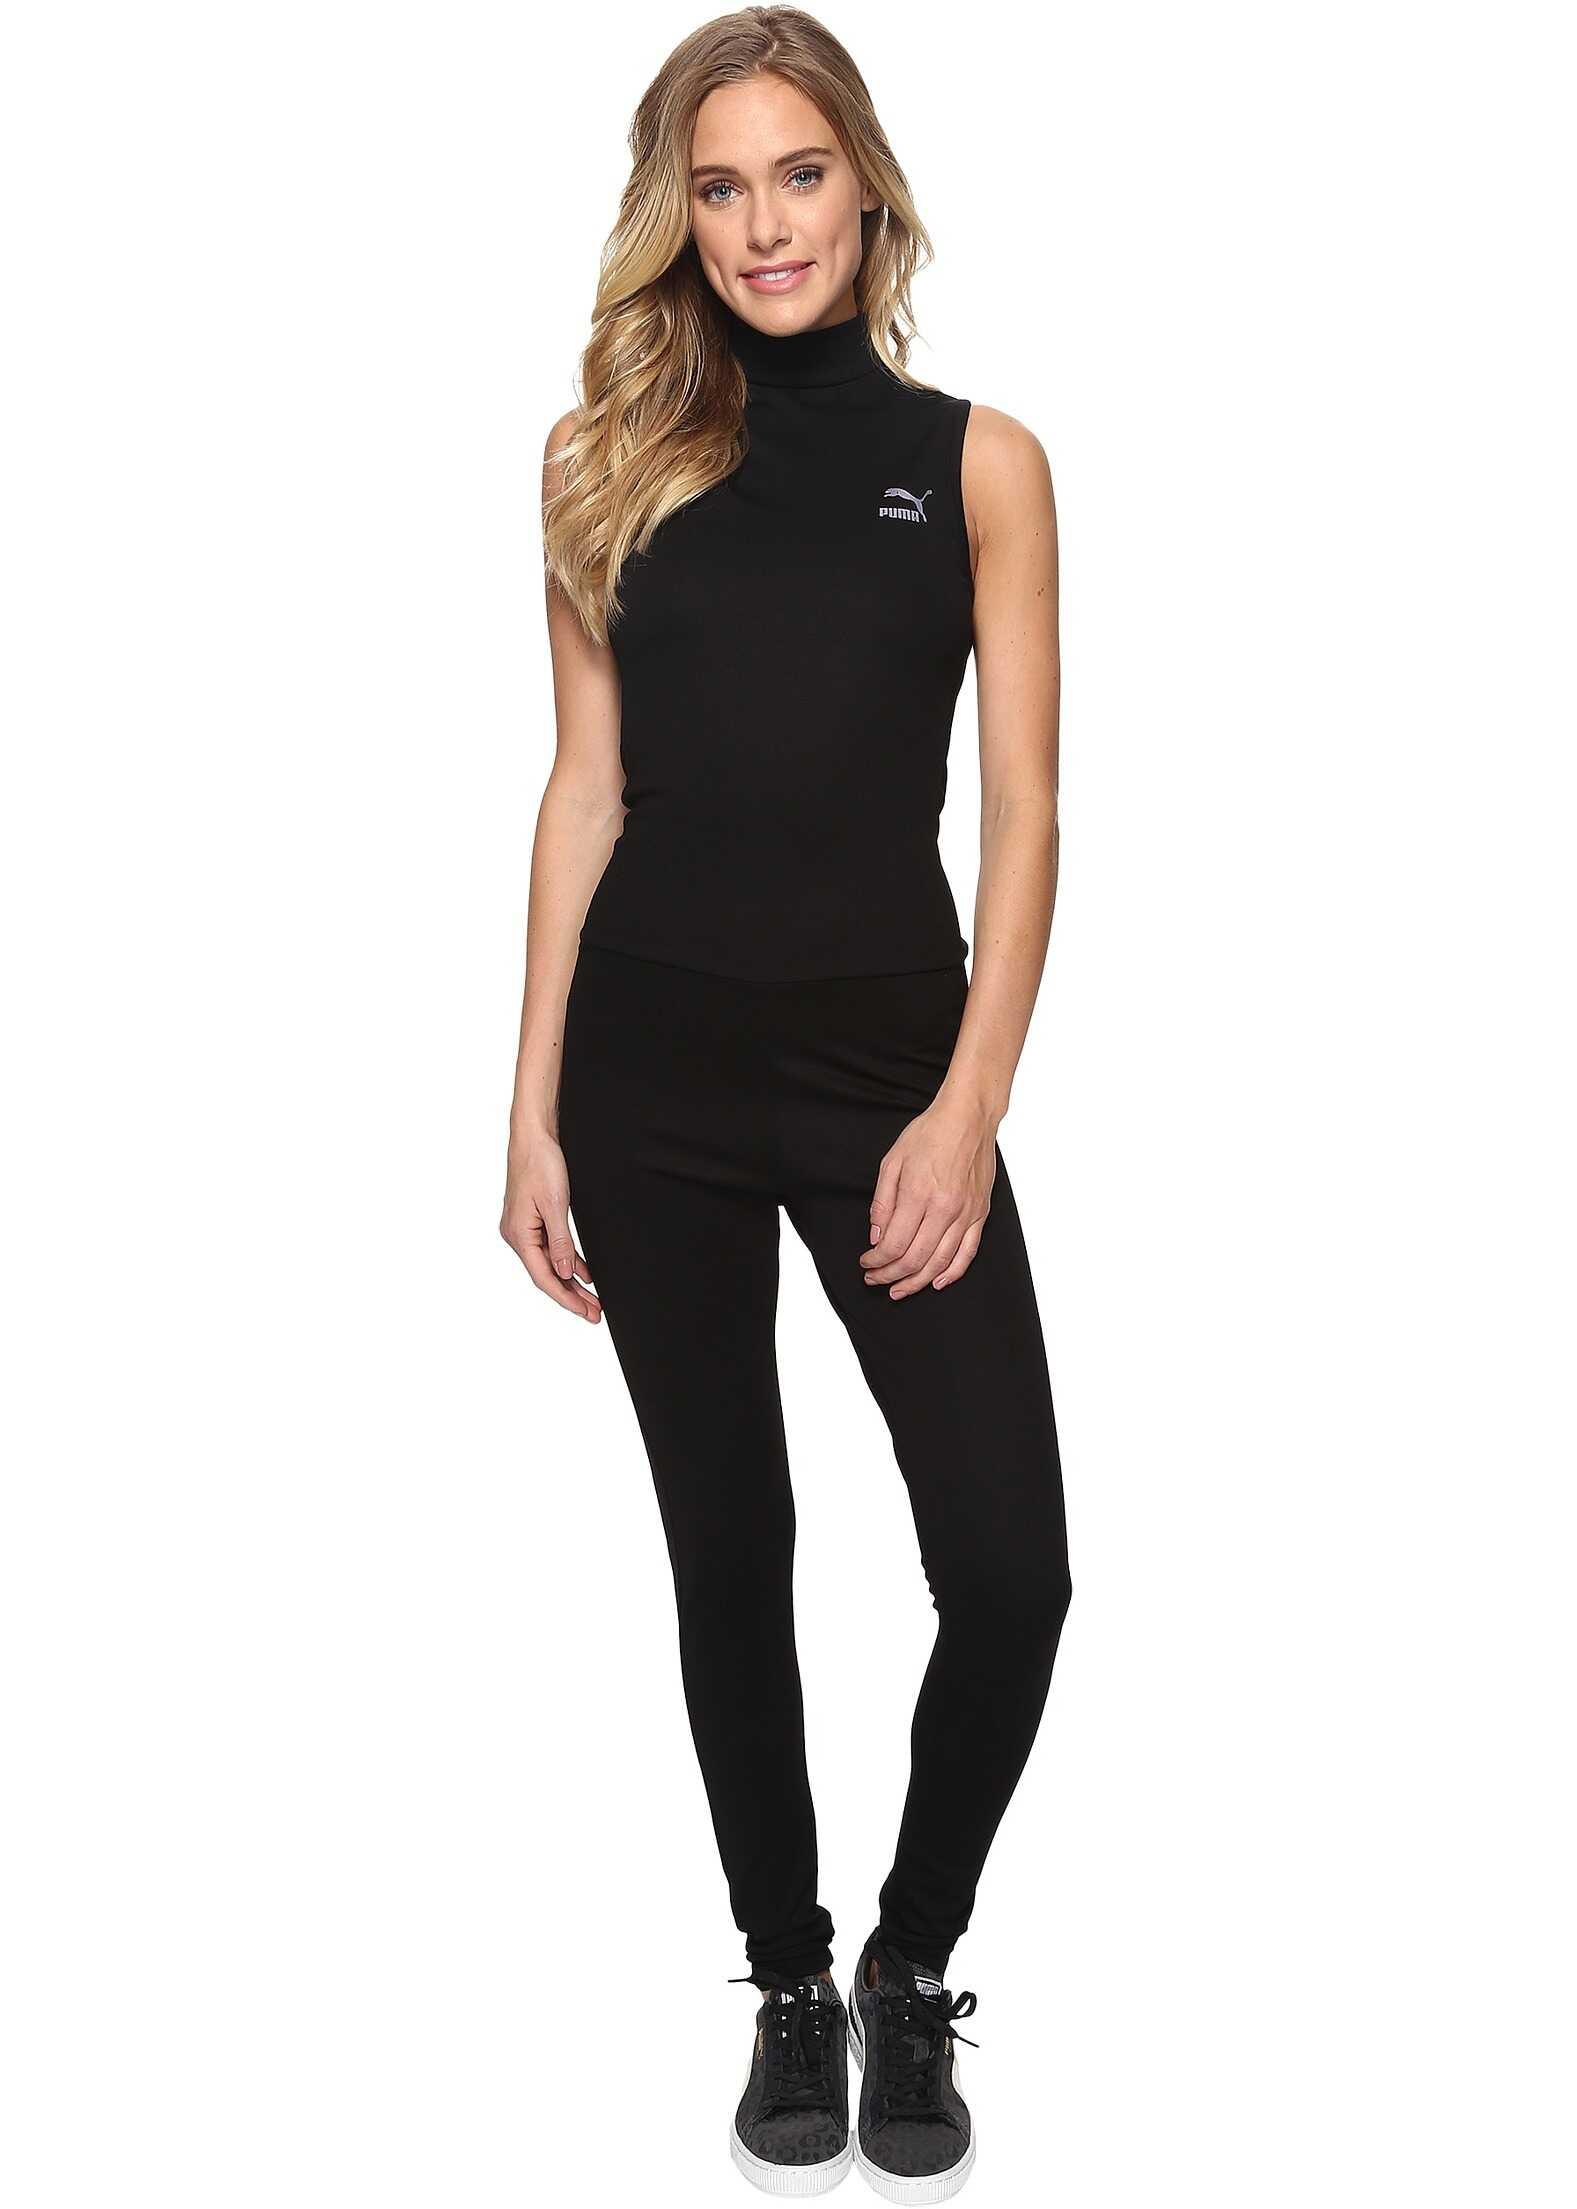 PUMA T7 Jumpsuit Black